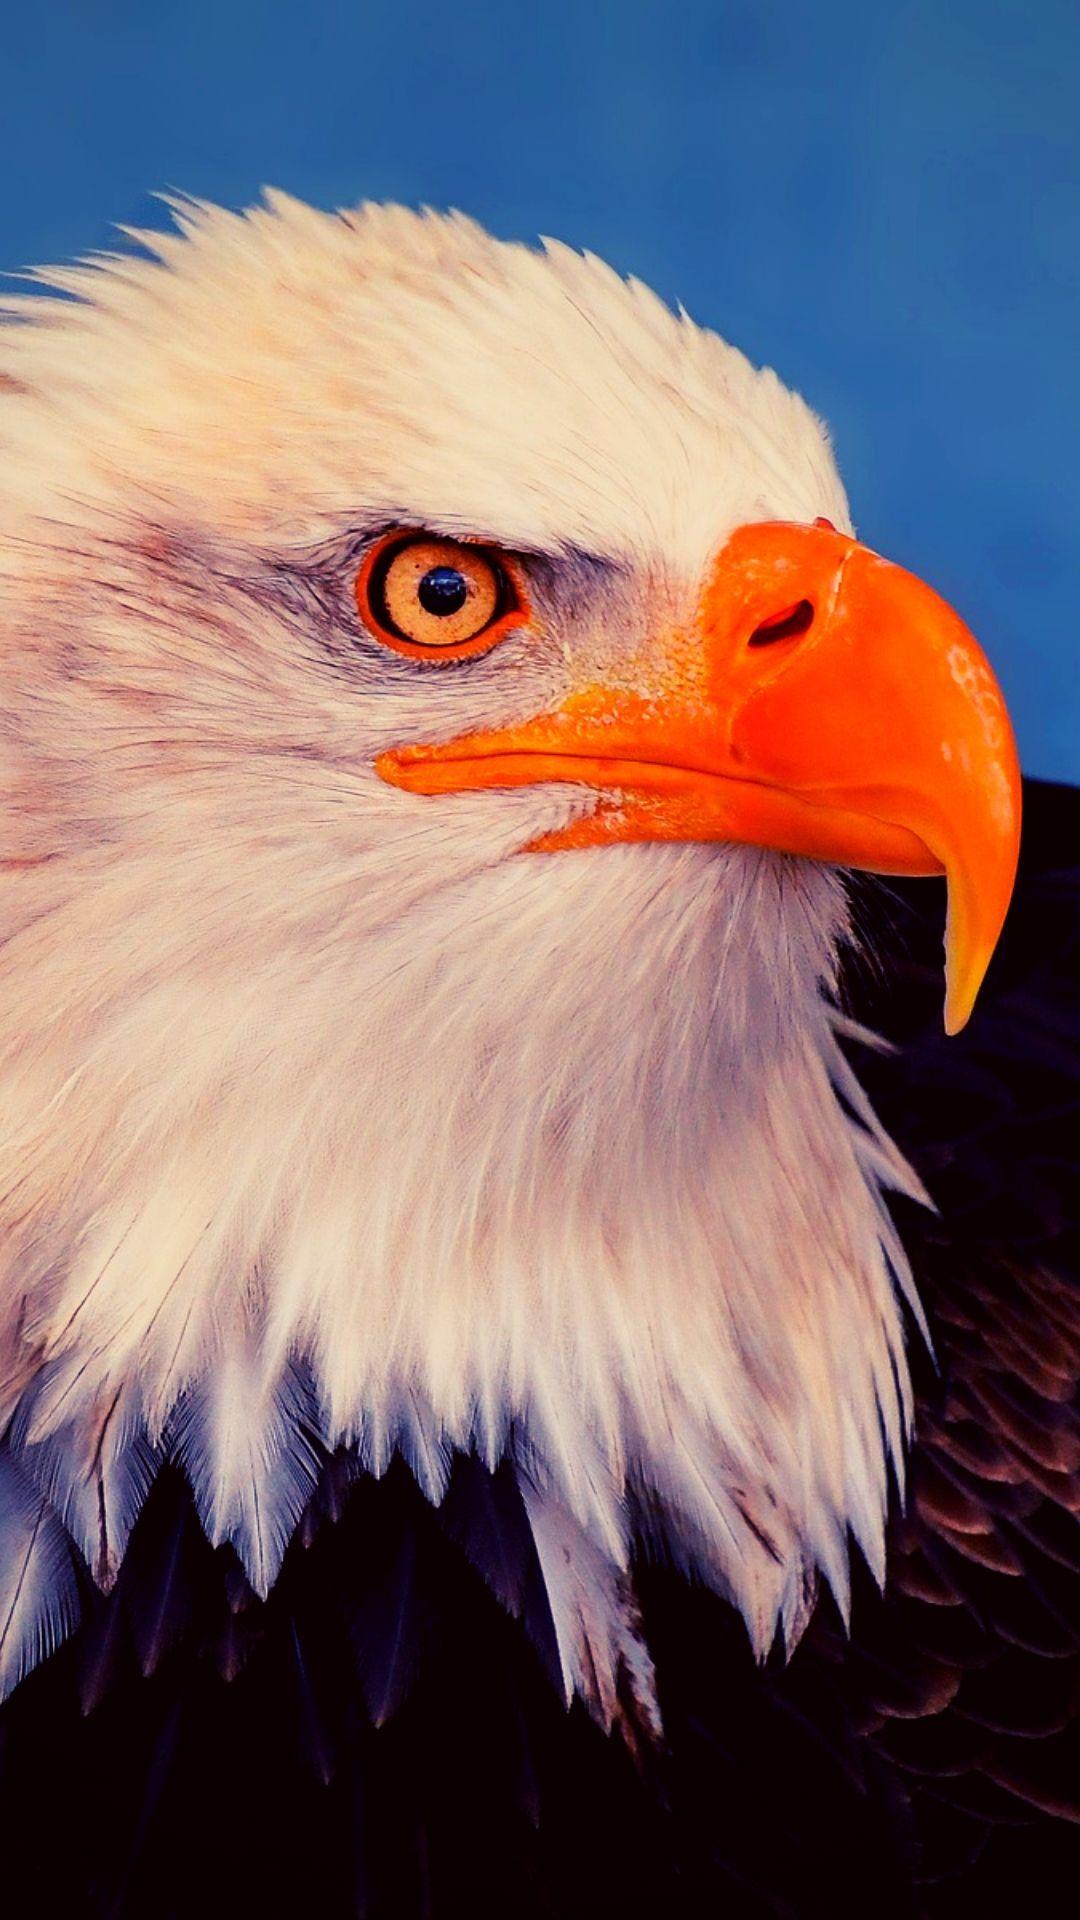 Eagle Iphone Wallpaper Best Hd Wallpaper Free Download Eagle Wallpaper Iphone Wallpaper Eagle Wallpaper Iphone Eagle images hd wallpaper download